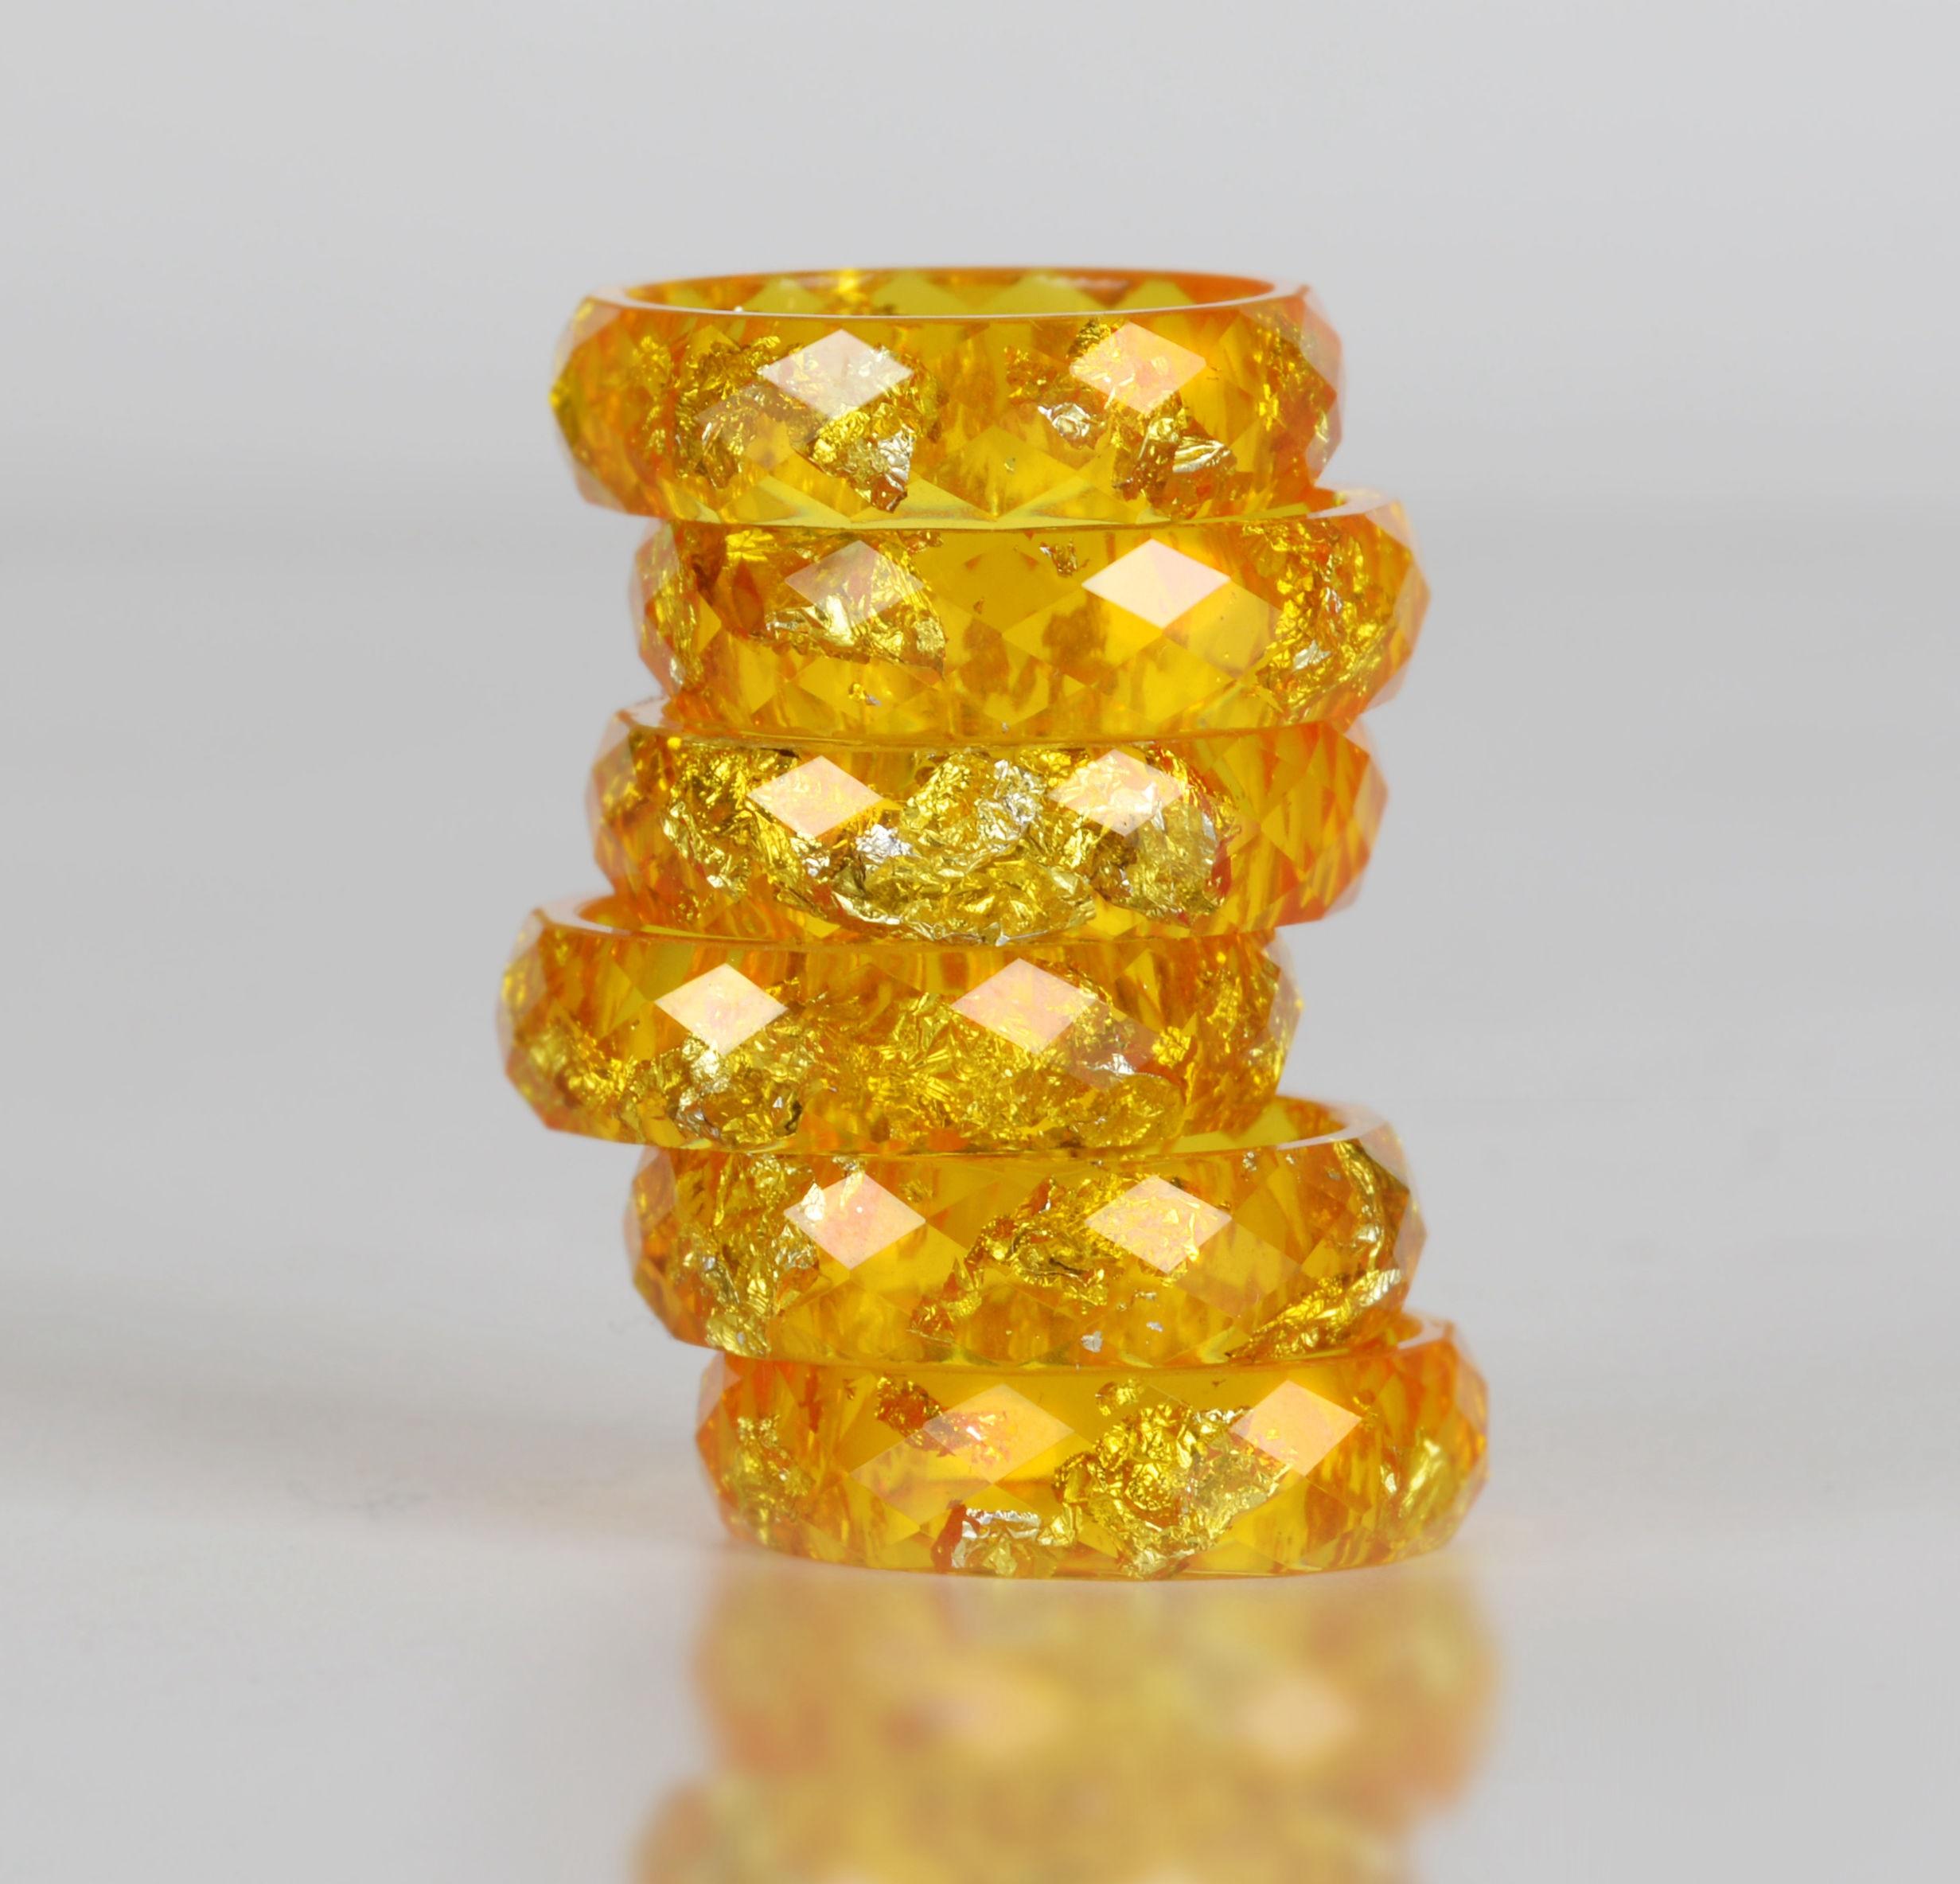 H3d3d6147561c43ccbbc9d3960d0bfdabb - Crystalic Resin Ring